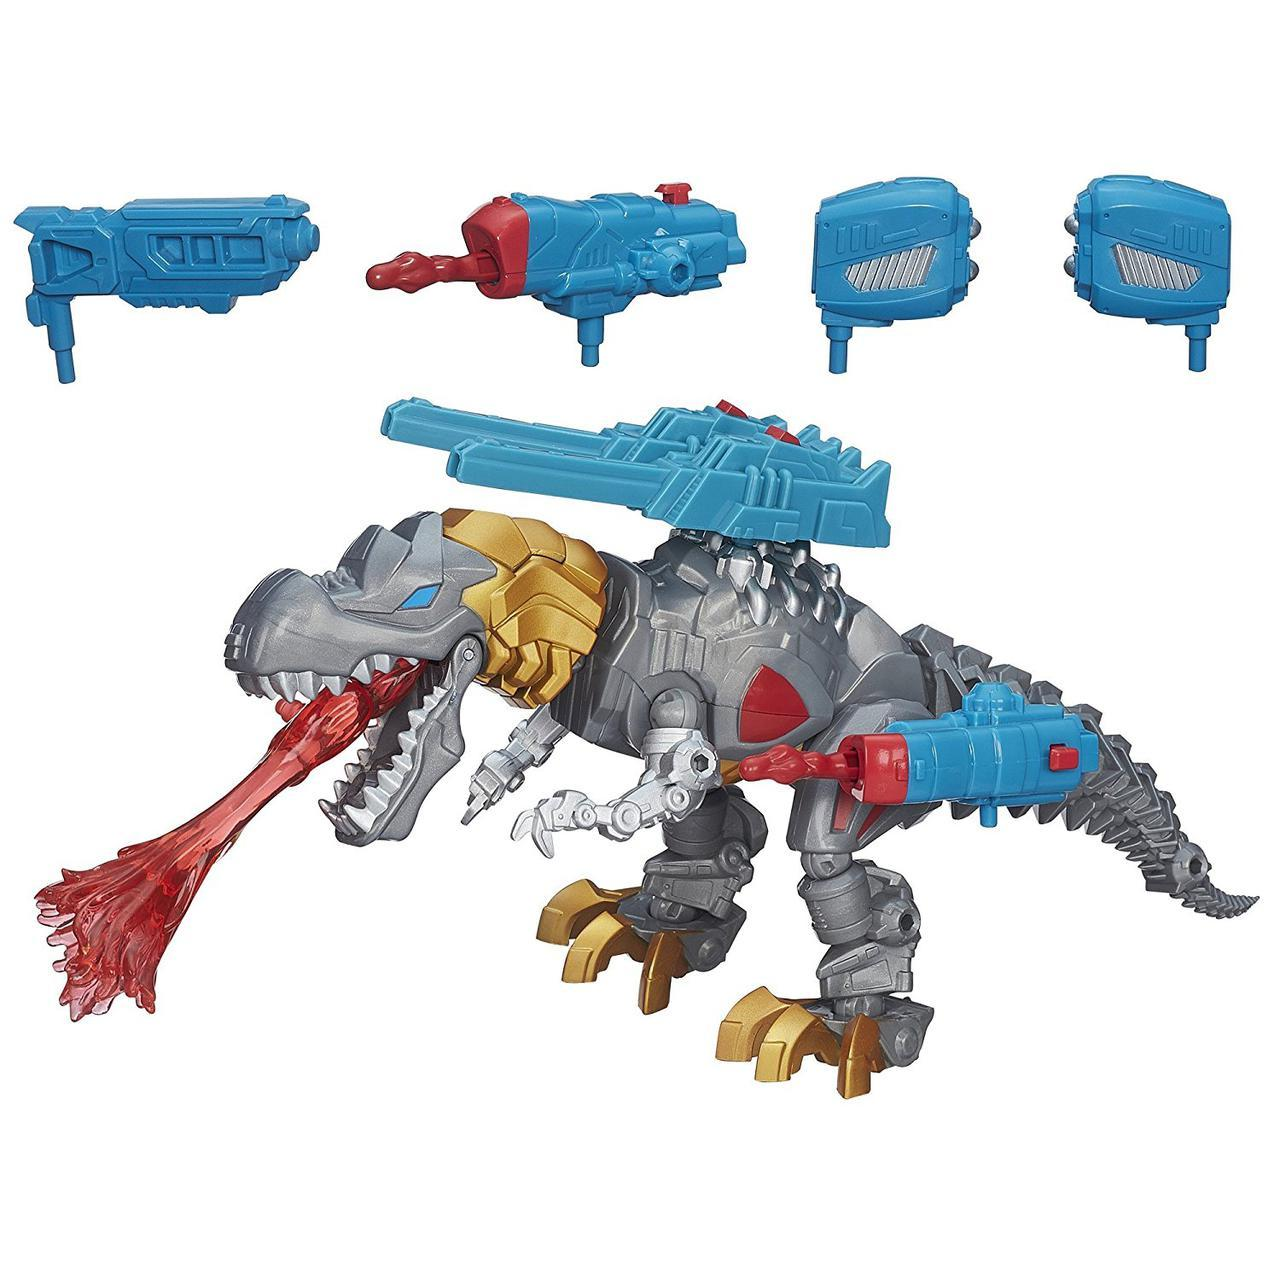 Игрушка-конструктор Гримлок с подсветкой - Electronic Grimlock, Mashers, Hasbro, фото 1